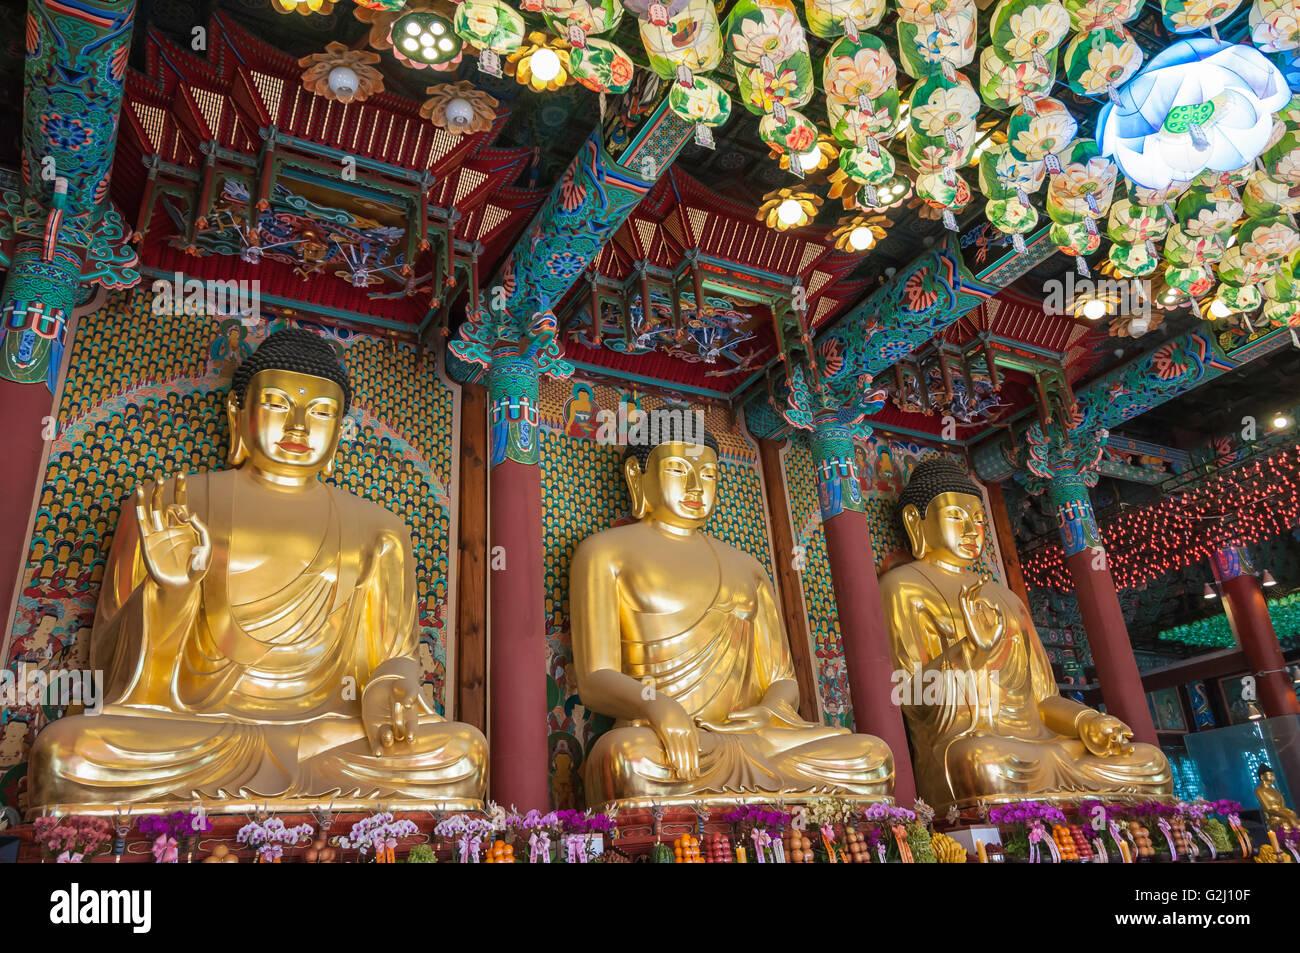 Golden Buddha statues inside the Daeungjeon, Main Dharma Hall, Jogyesa, Seoul, South Korea Stock Photo